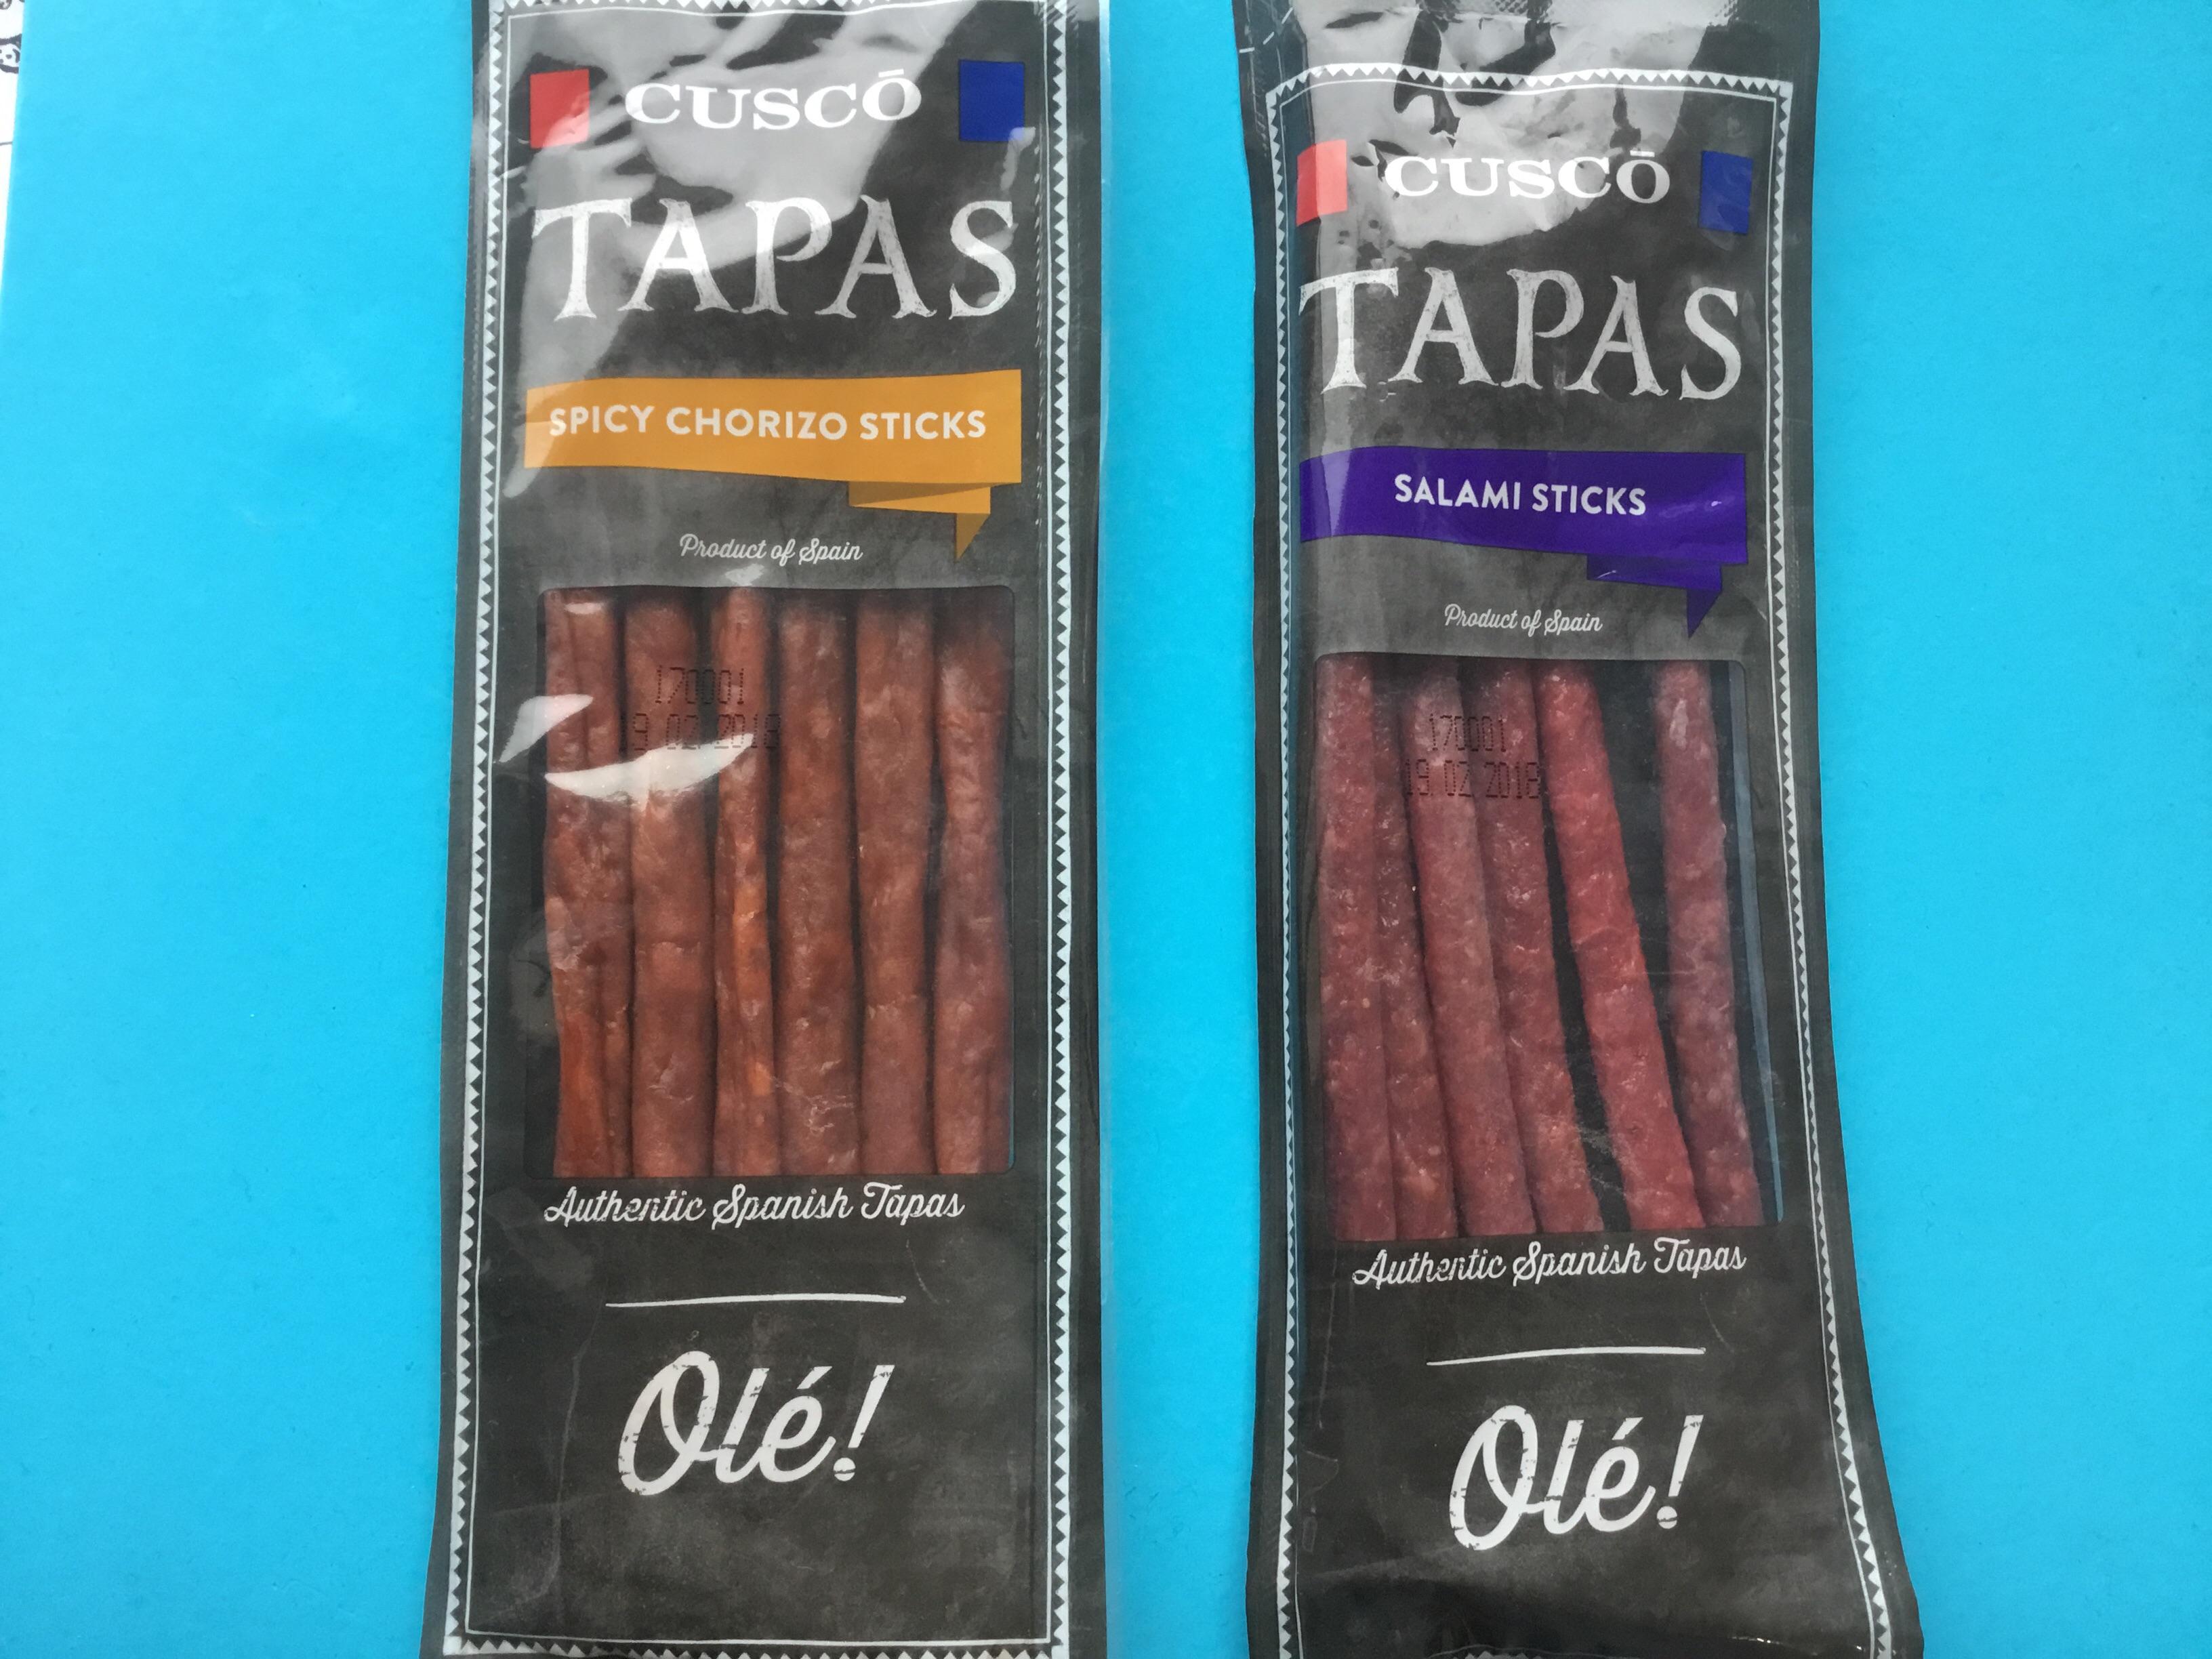 Cusco Tapas Spicy Chorizo Sticks 60g / Salami Sticks 60g @ ALDI 0.50p